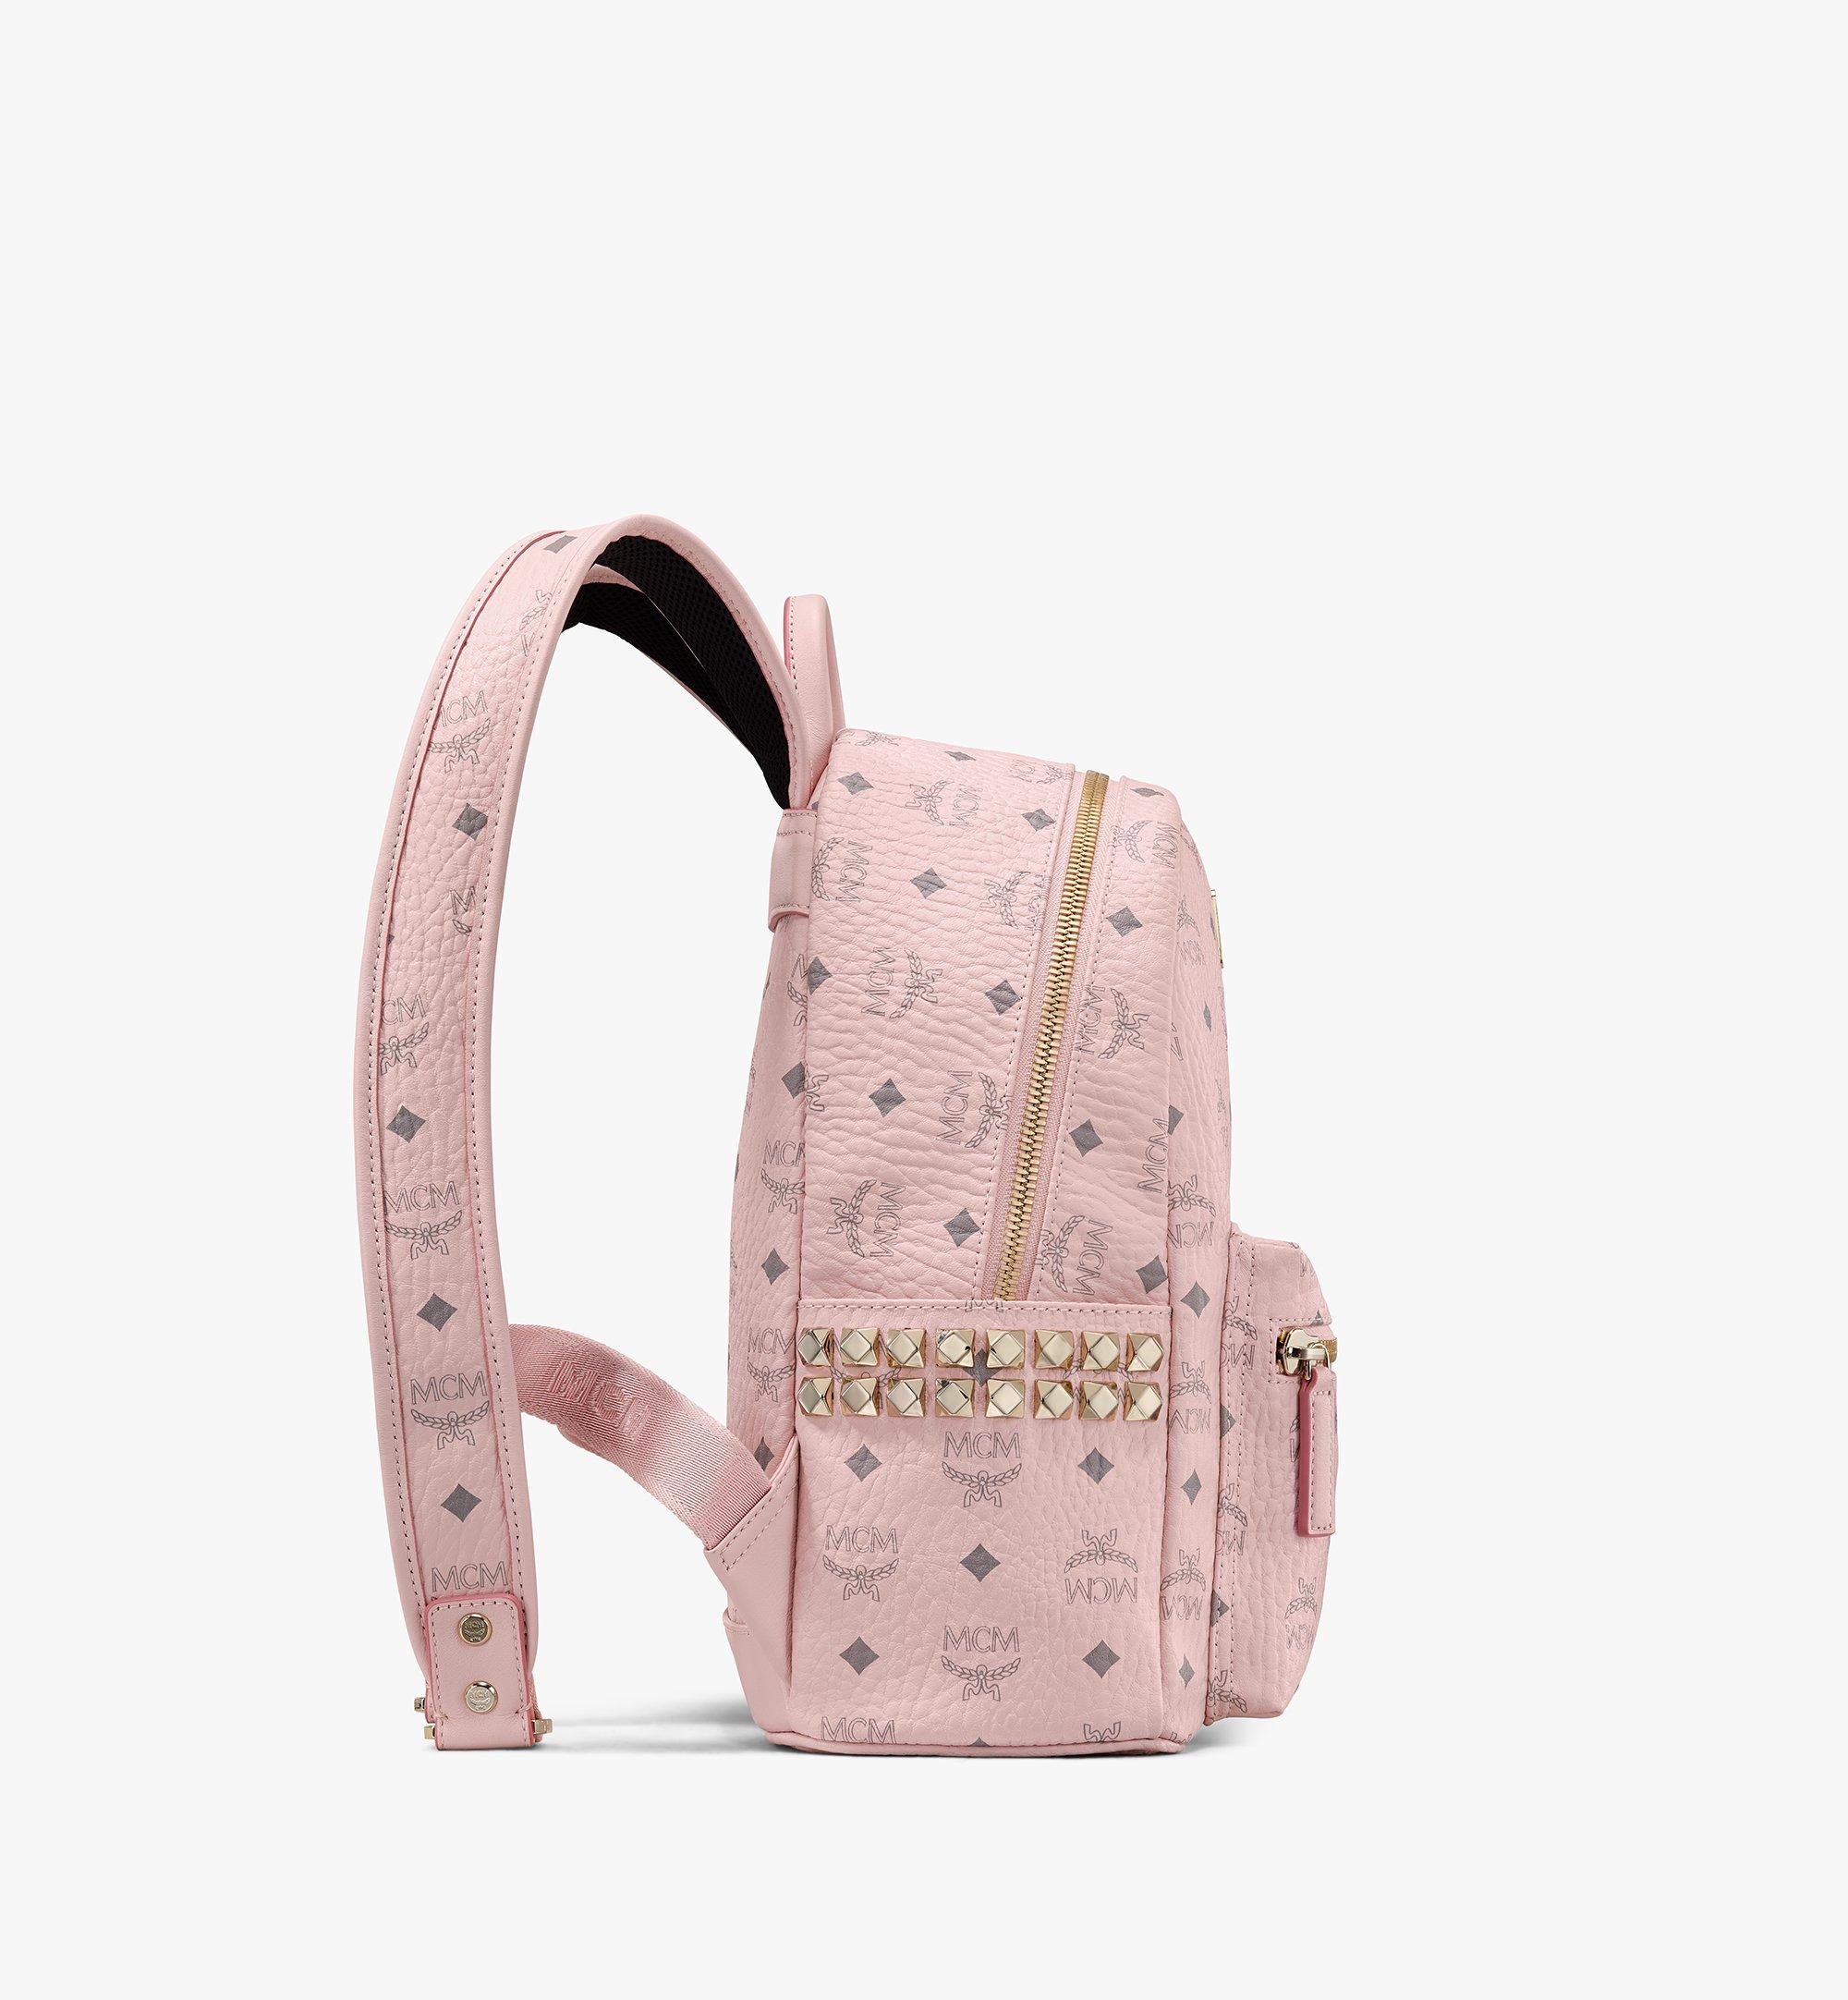 MCM Stark Side Studs Backpack in Visetos Pink MMK6SVE37QH001 Alternate View 1